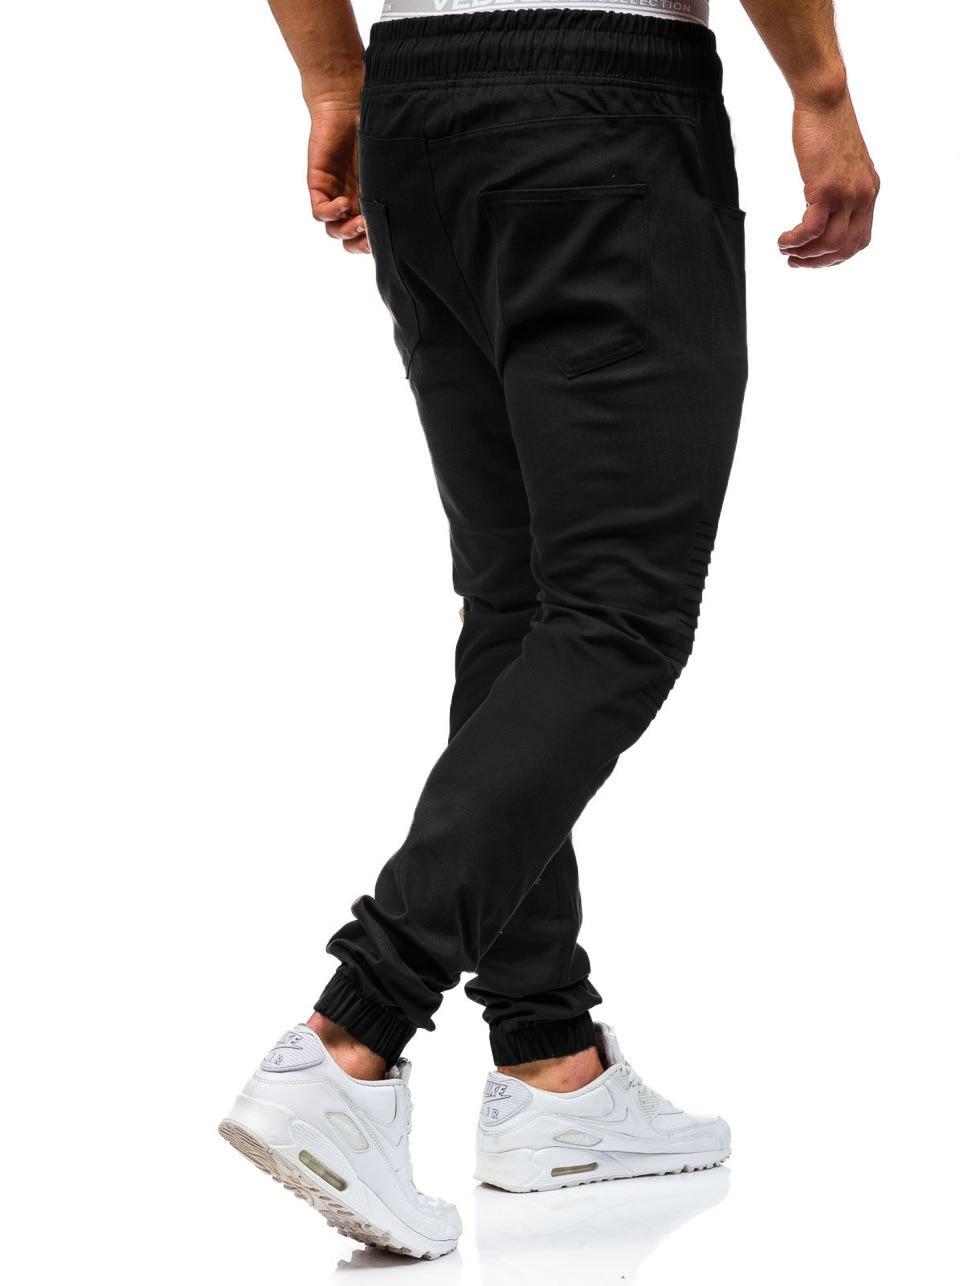 Men Sweatpants Casual Pants Slim fit Drawstring Sweatpants Slacks Elastic Waist Patchwork Pleated Ultrathin Male Trousers Jogger 16